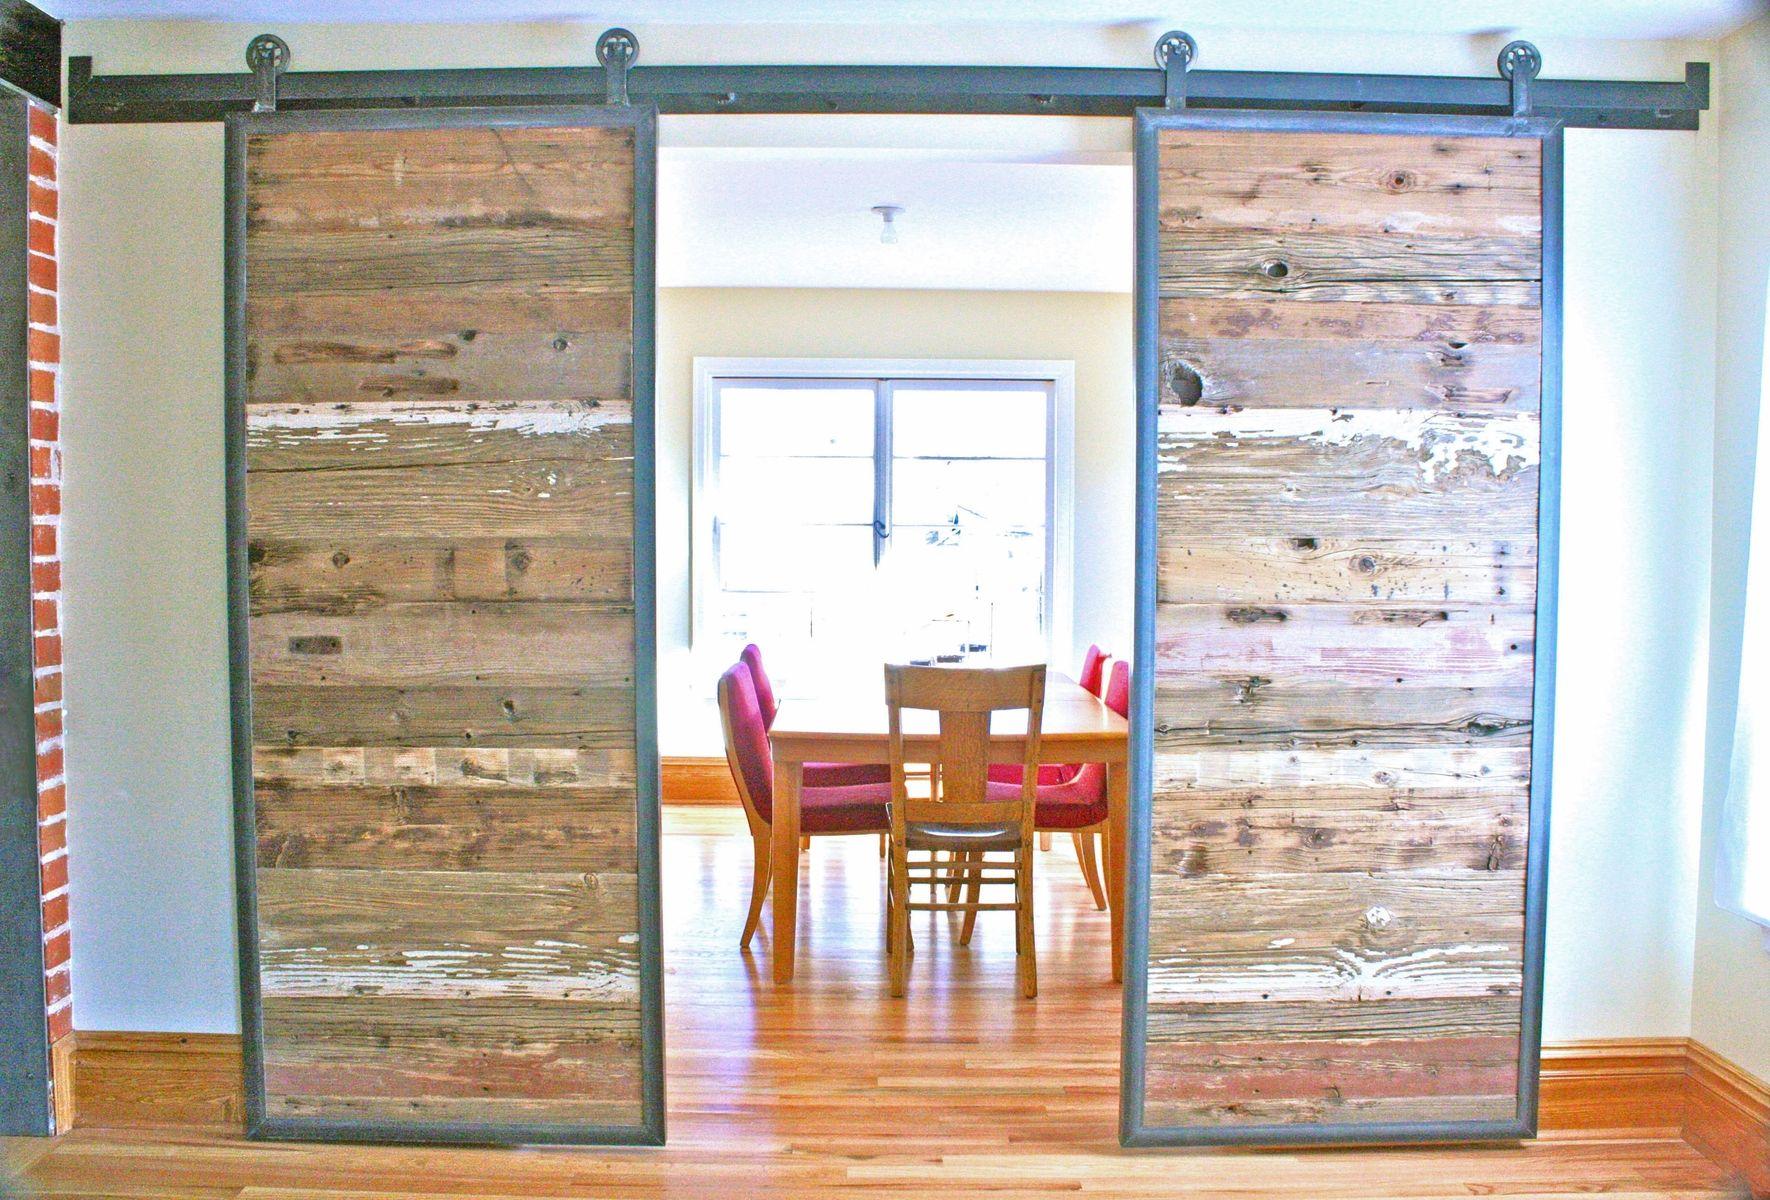 Lovely industrial reclaimed barn doors on a custom steel track